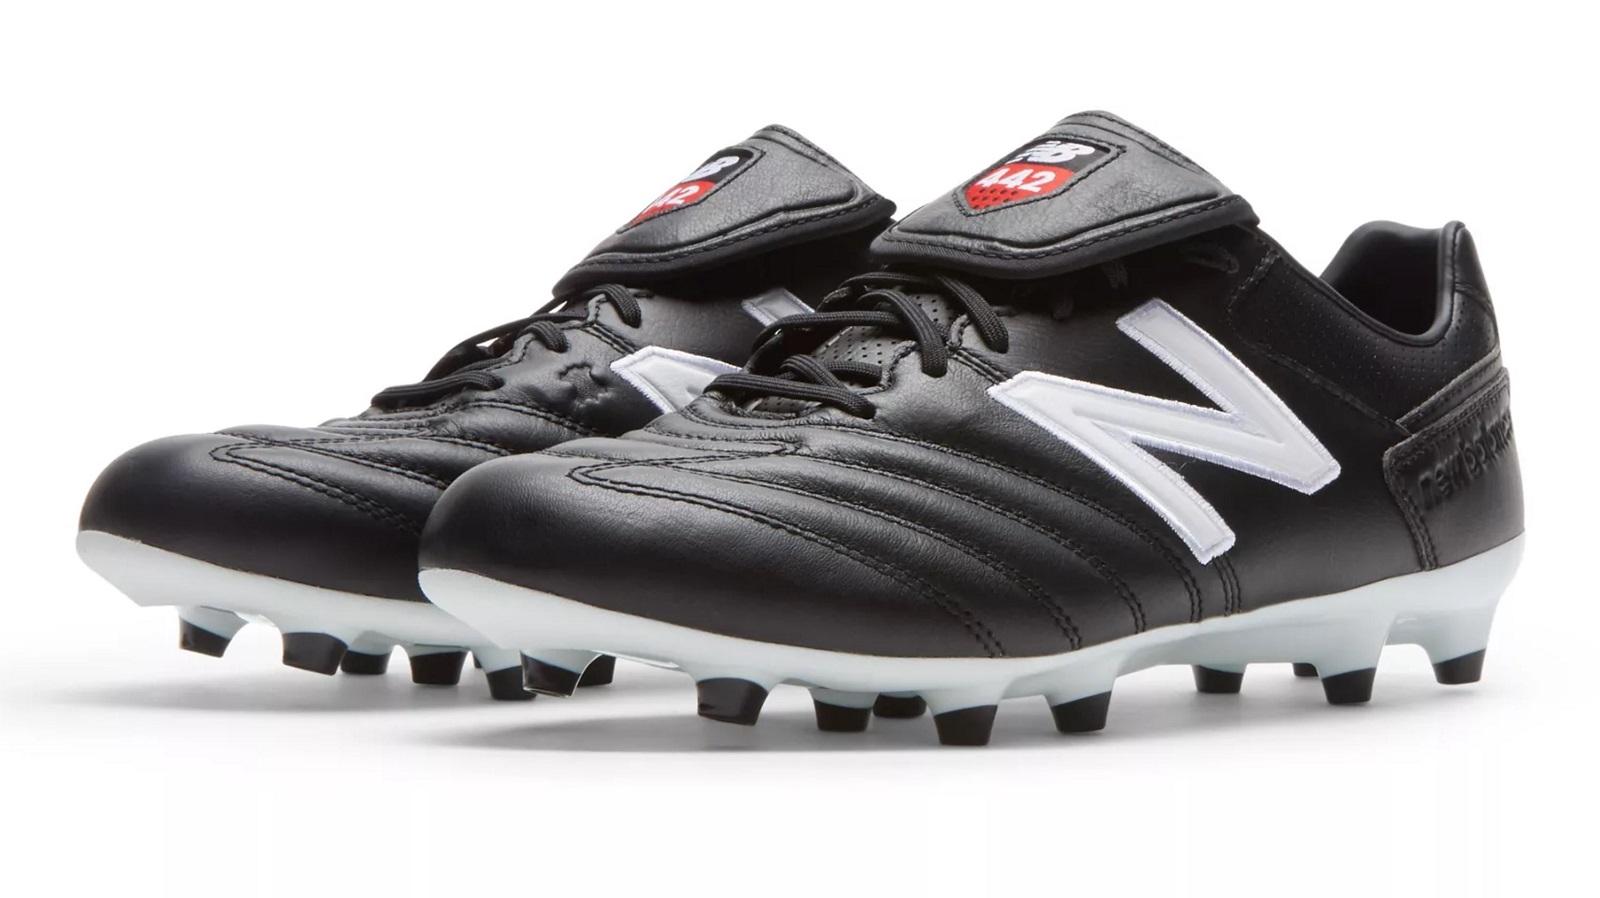 c95bb88b9d92c New Balance 442 Pro Released | Soccer Cleats 101